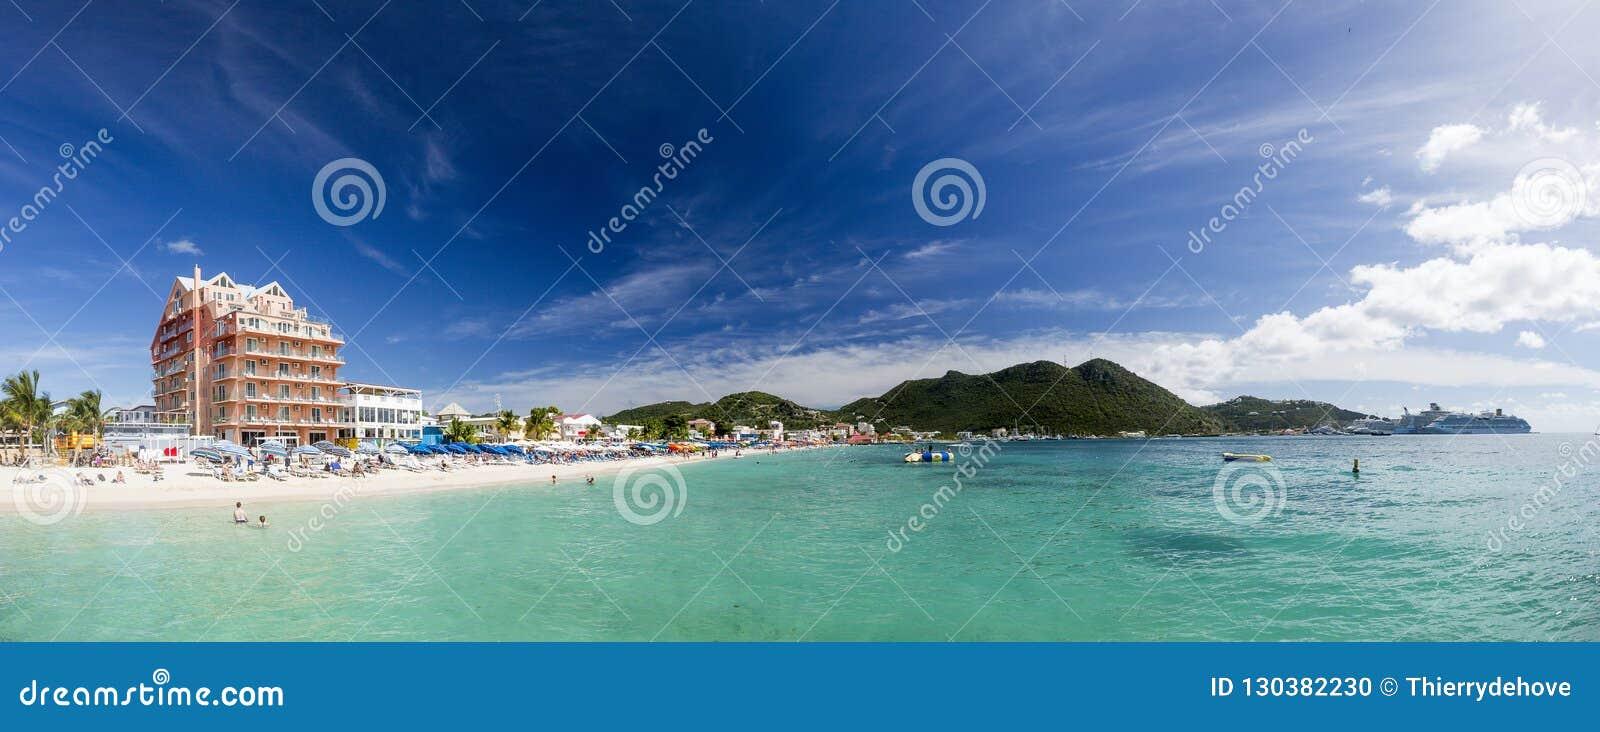 Panoramique de Saint Martin, Sint Maarten : Plages des Caraïbes